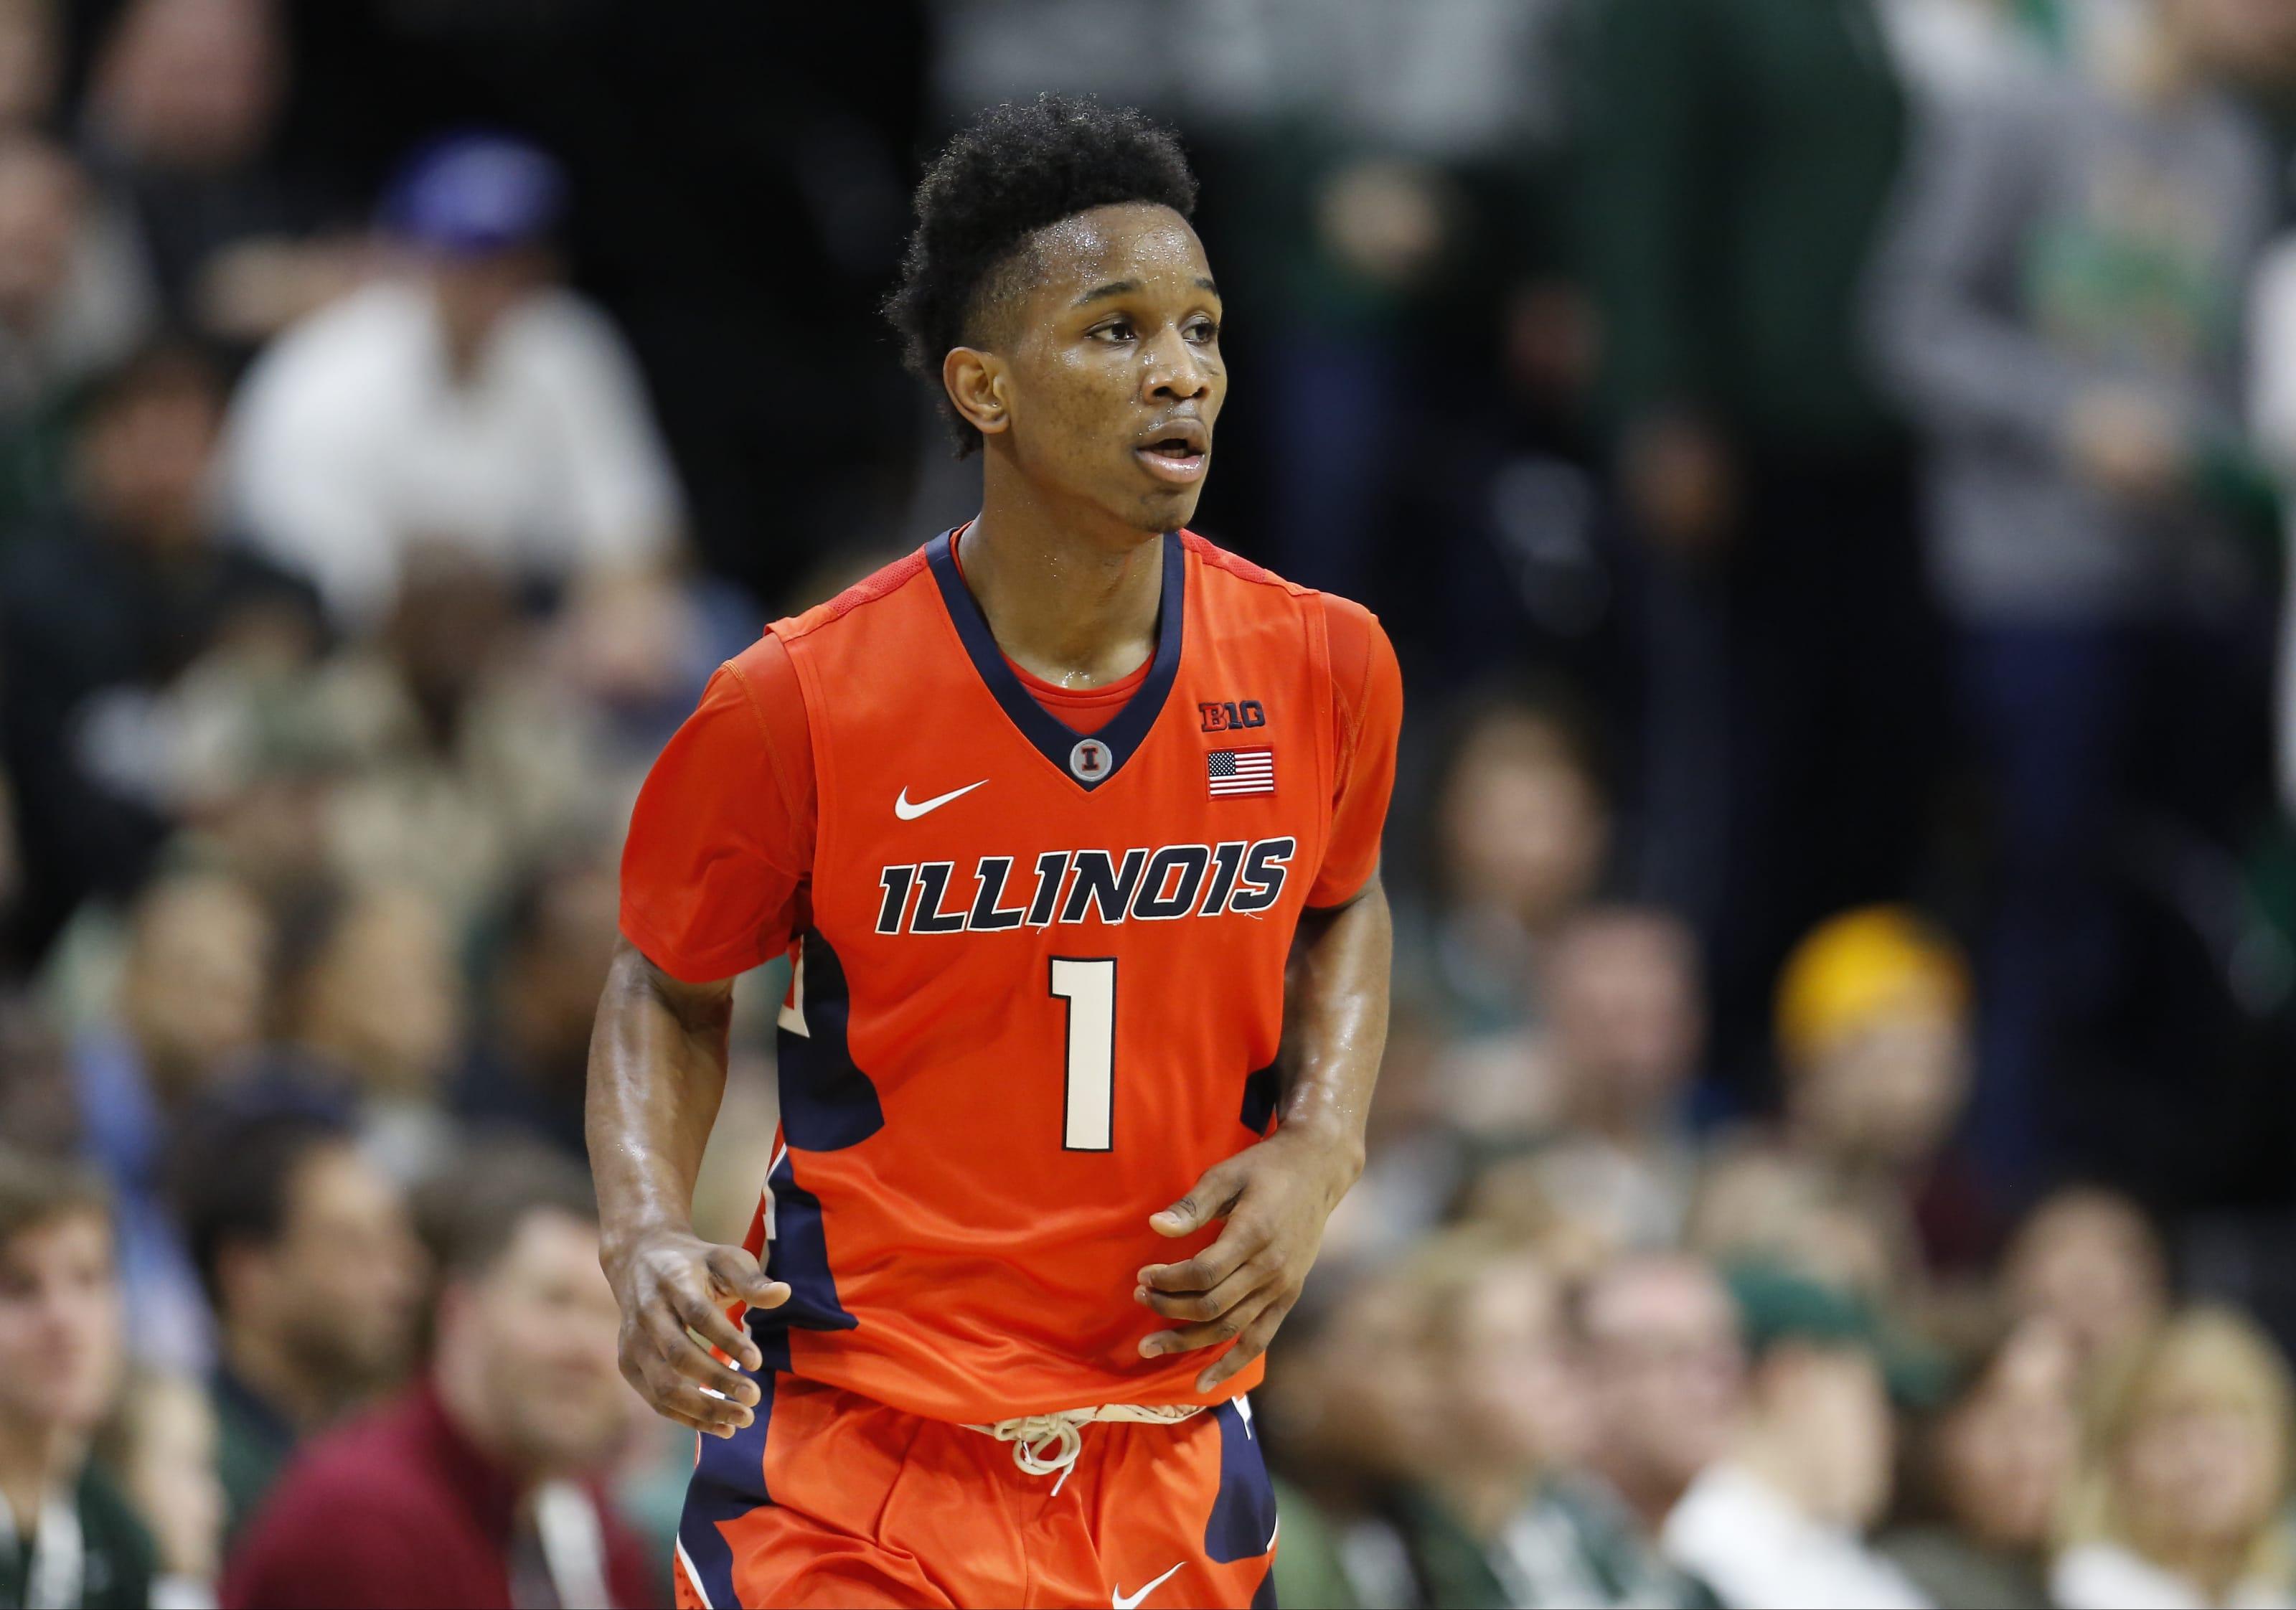 Illinois Basketball: 2018-19 season preview For the Illini - Page 2